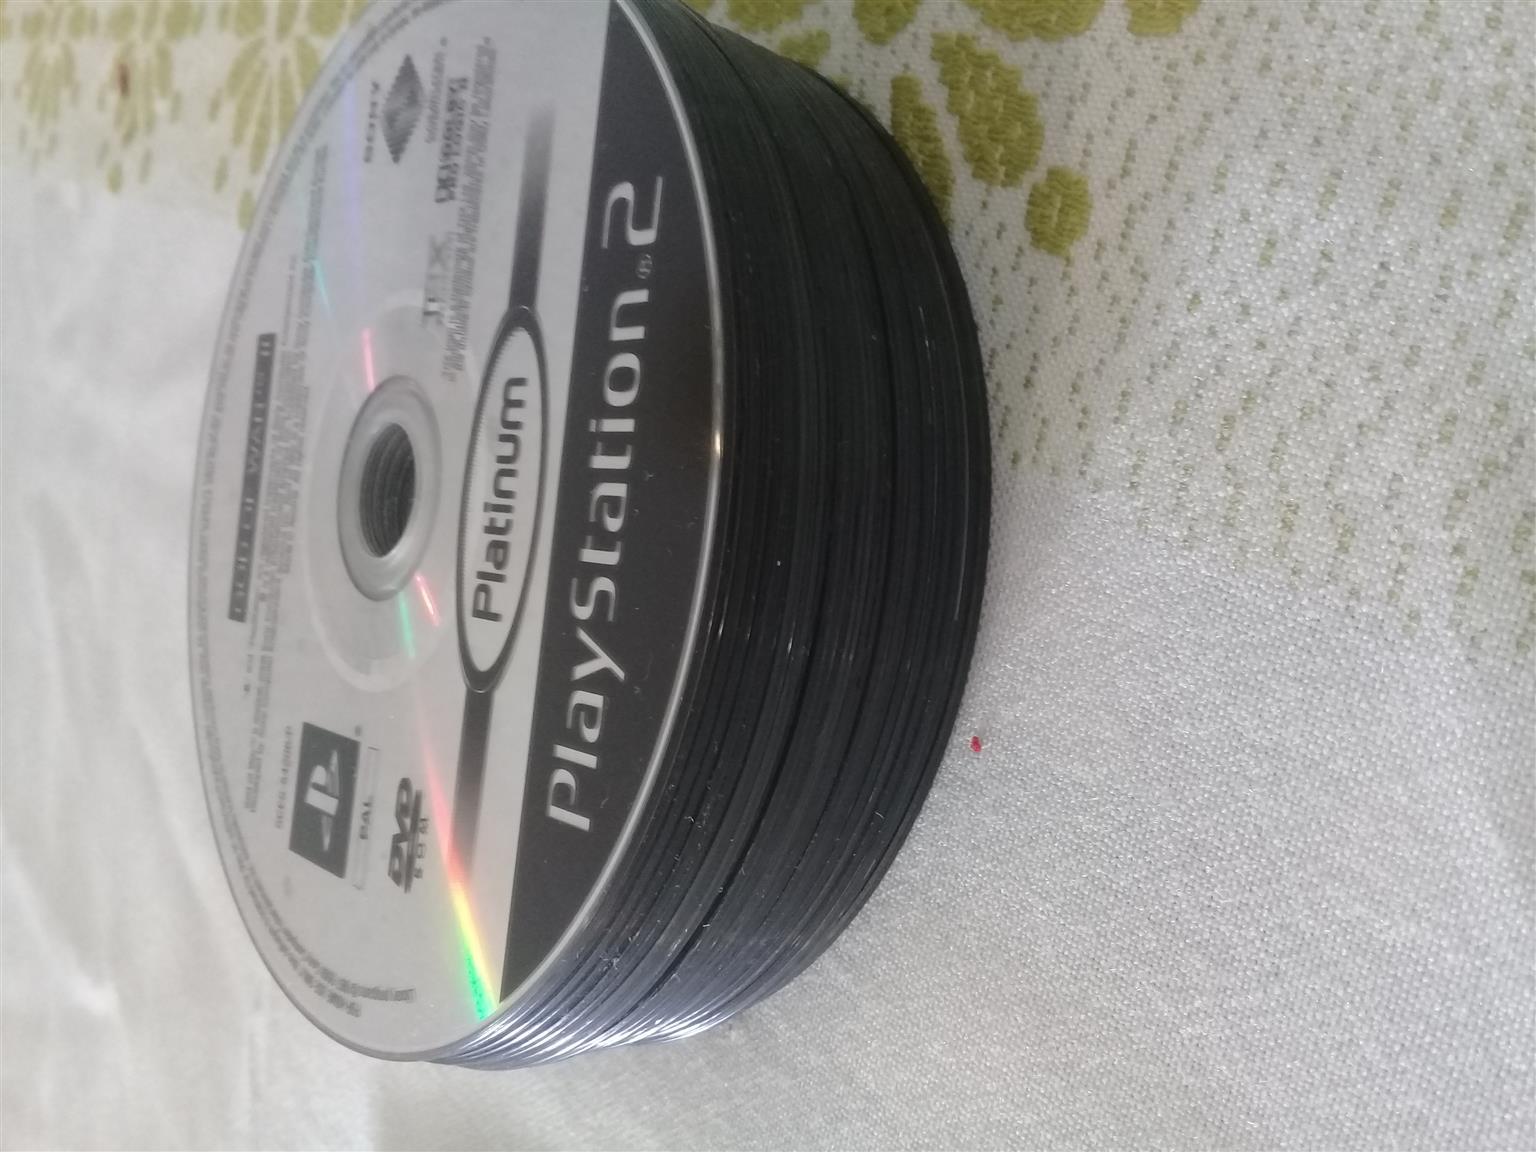 Sony Playstation 2 BLACK slim